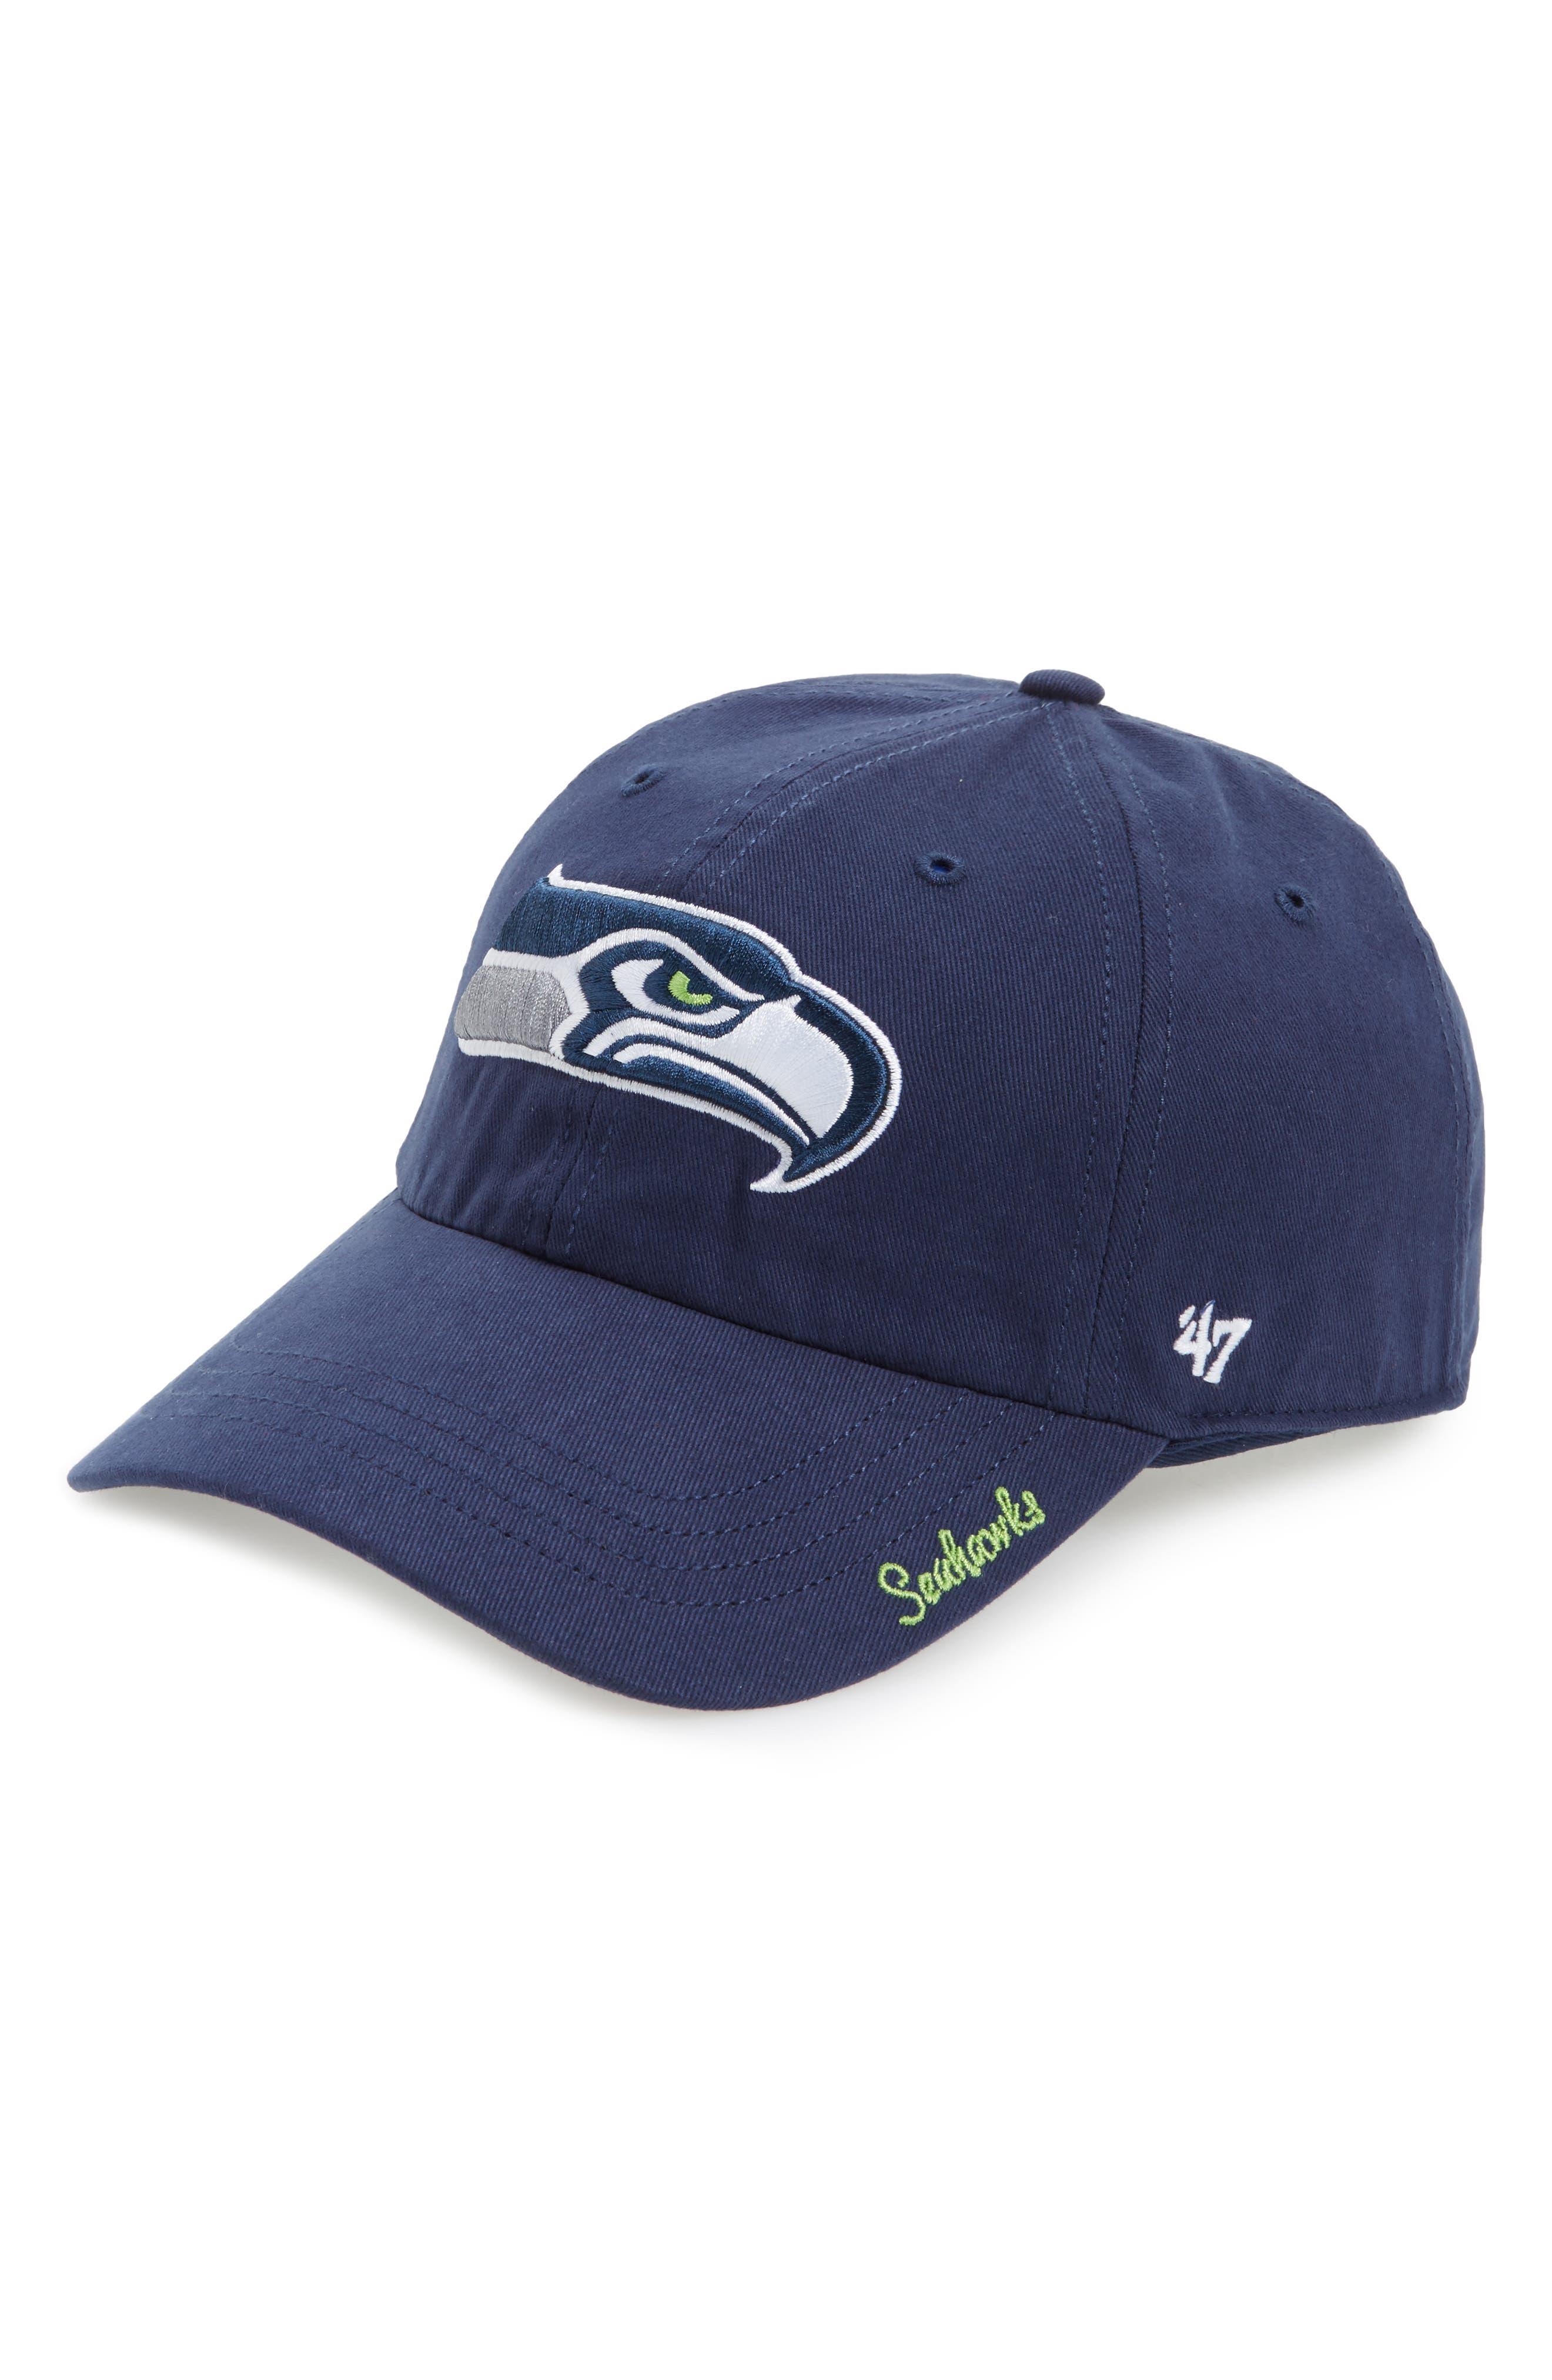 Main Image - '47 Seattle Seahawks Cap